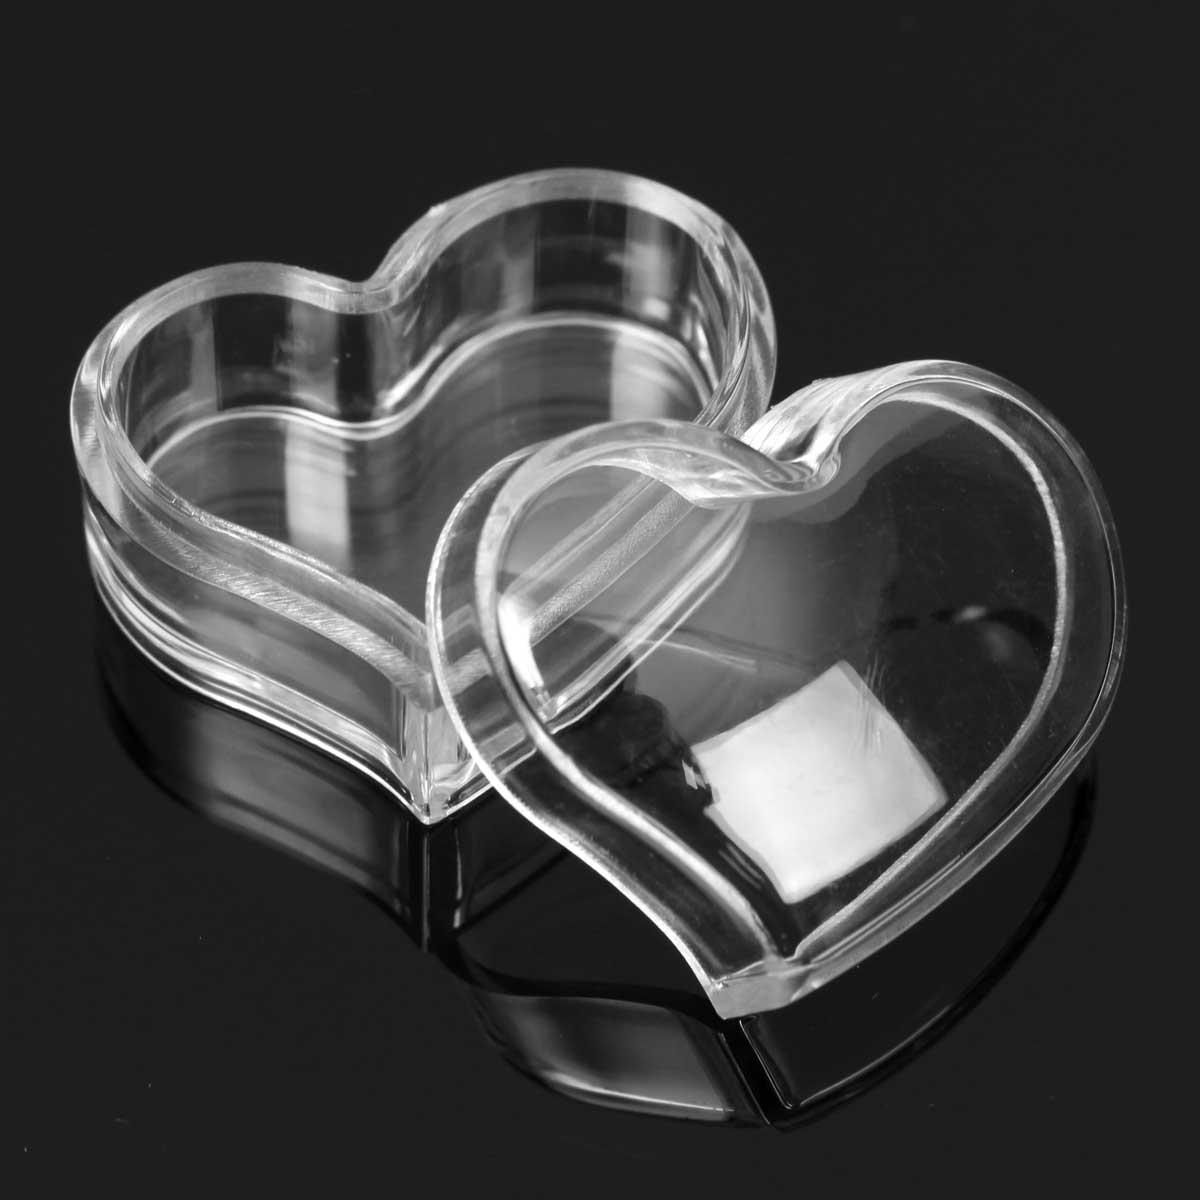 Empty Transparent Jar Pot Cream Box Makeup Face Cream Lip Balm Container